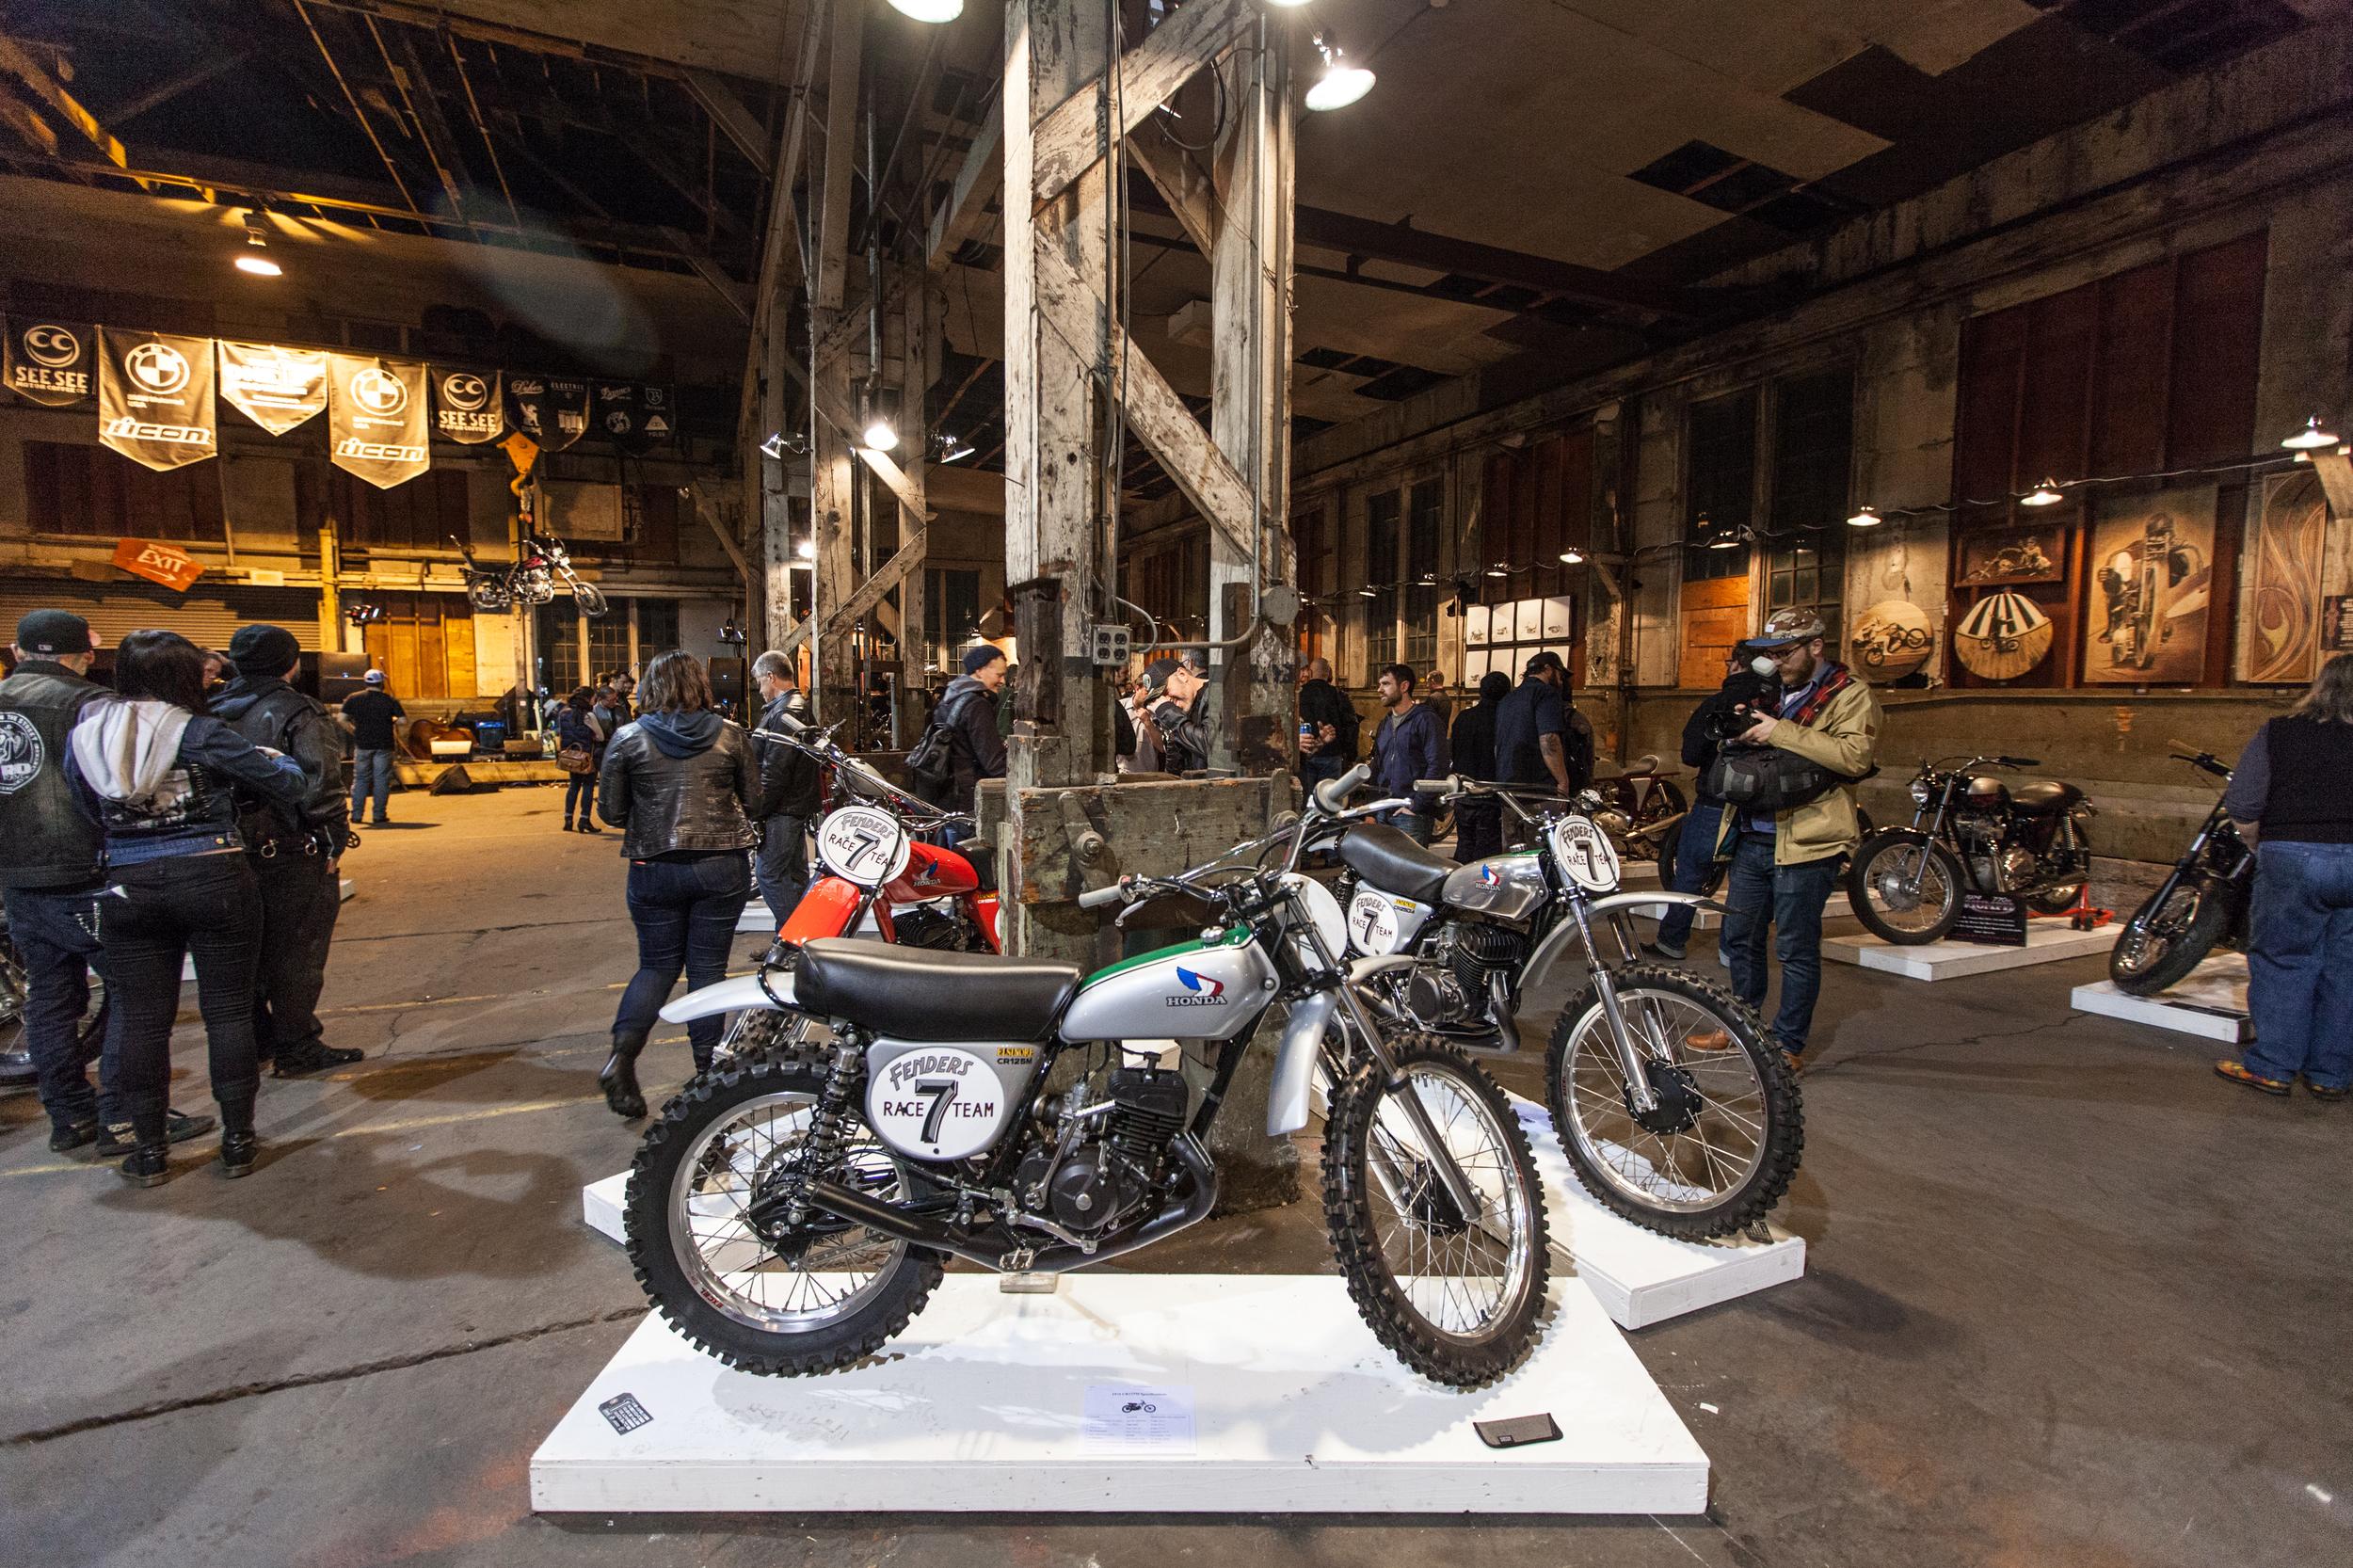 02-14-15 The 1 Moto Show - 1_-91-6.jpg